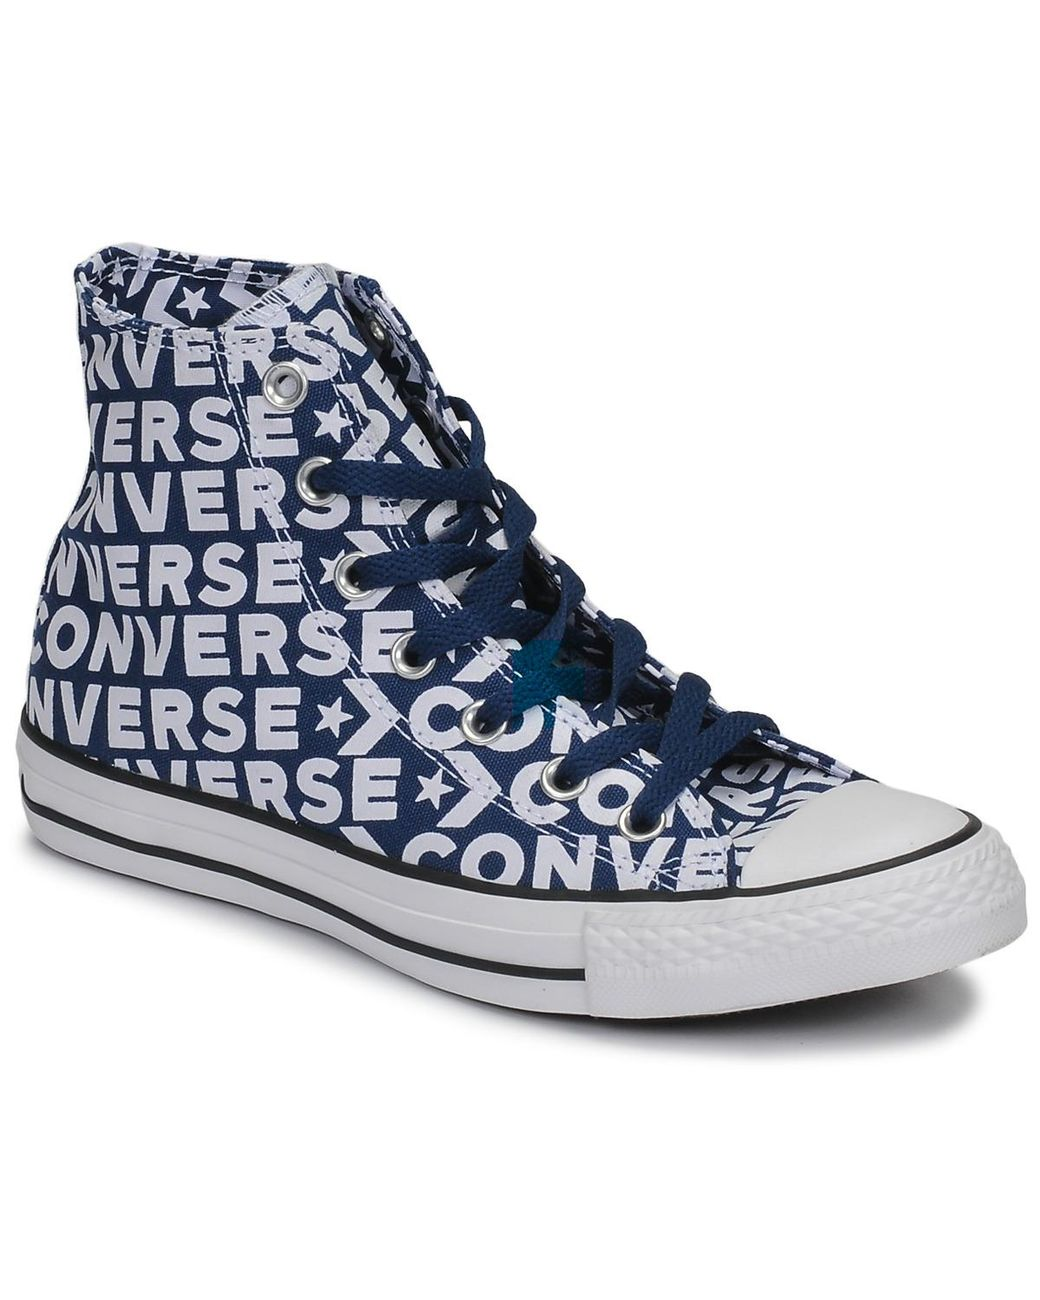 44223edde8bcd9 Converse Chuck Taylor All Star Wordmark Hi Women s Shoes (high-top ...